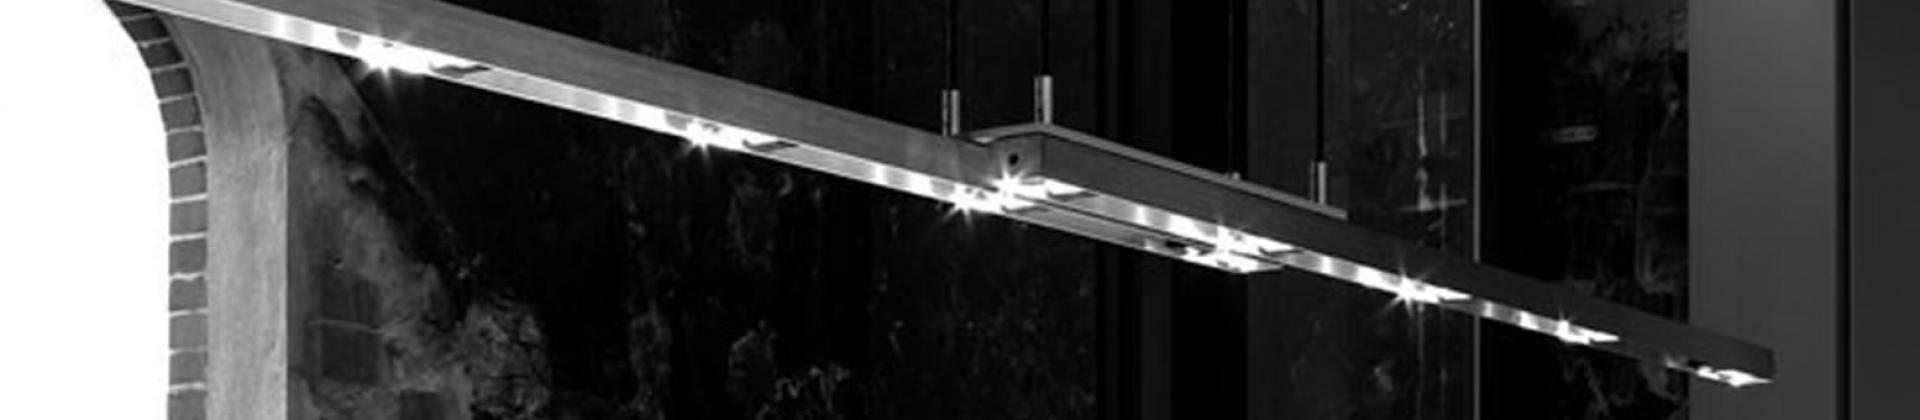 Jorg Zeidler Anta - Lámparas de diseño